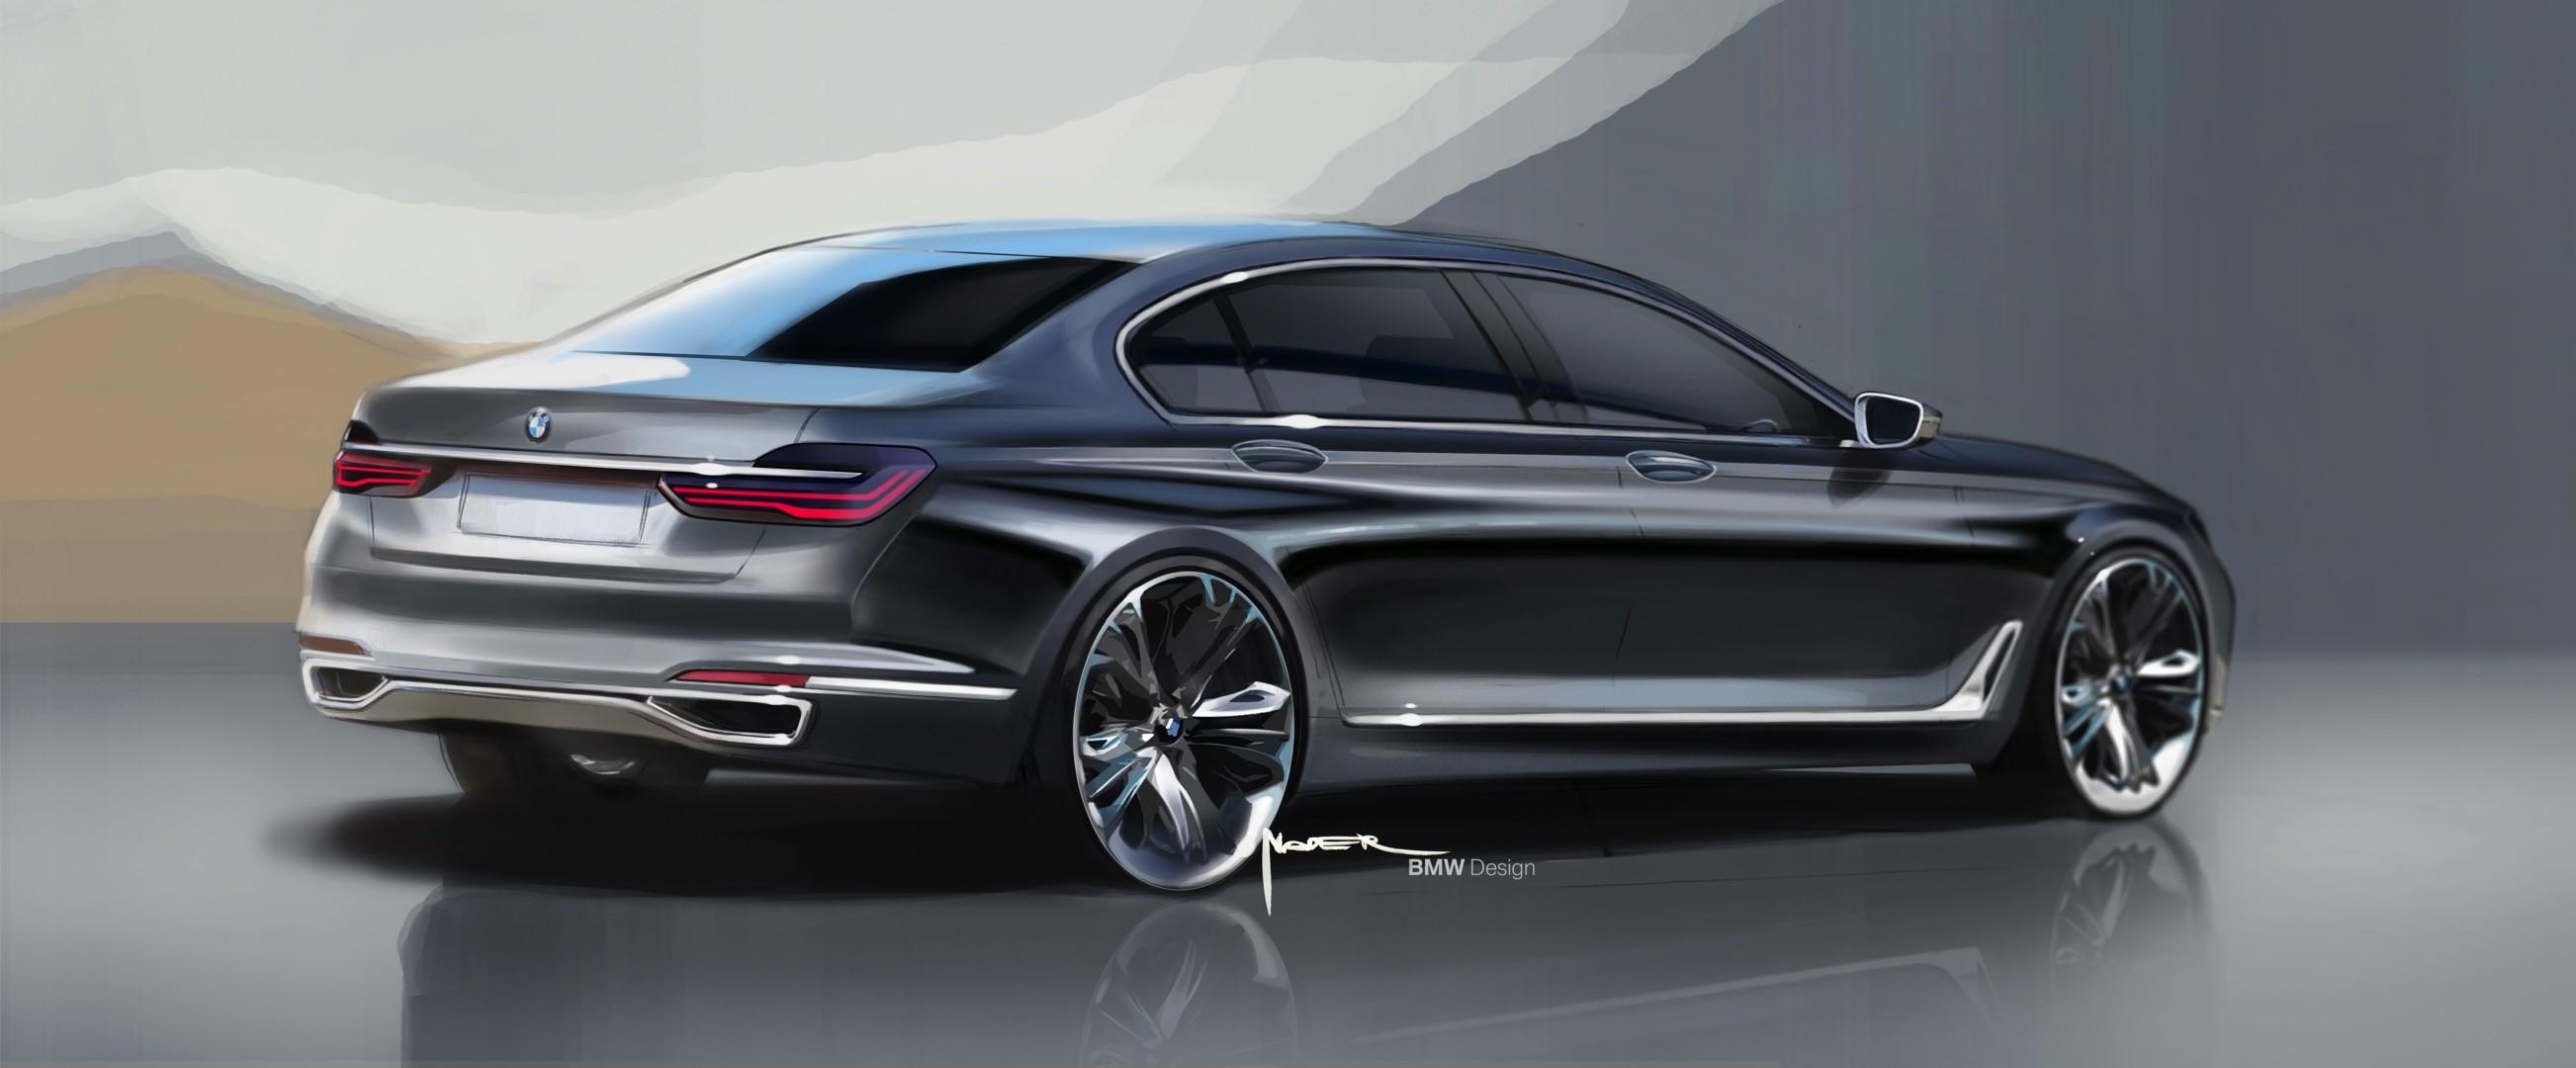 BMW 7 Series (G11/G12) - 2016